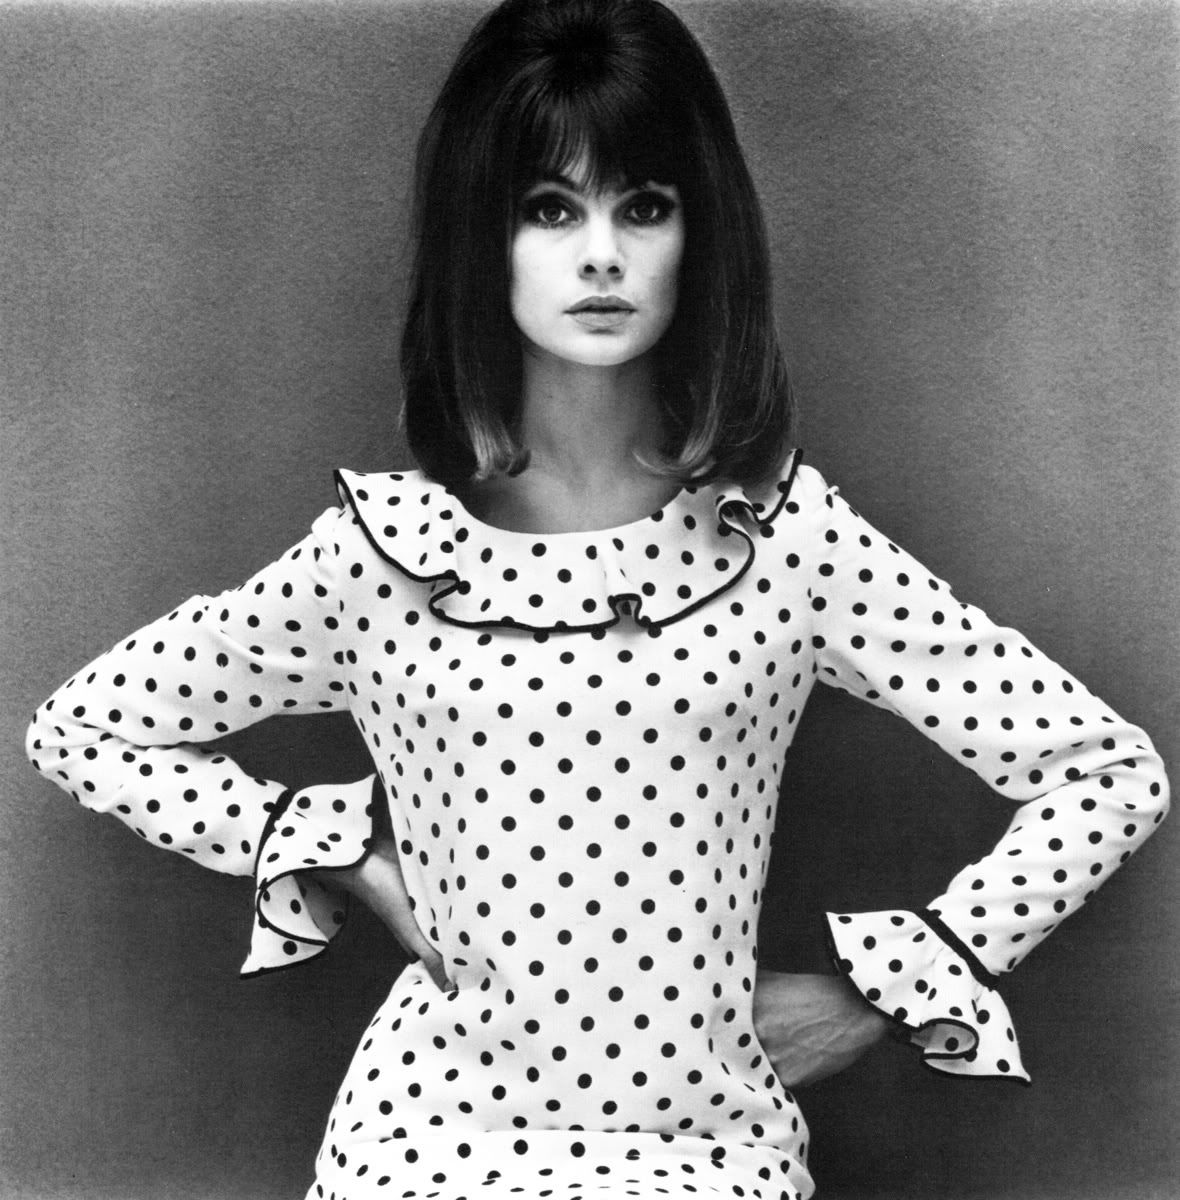 photographer john french 1960s john french pinterest jean Wrangler Jean Country Girl photographer john french 1960s 70s fashion british fashion fashion history 1960s fashion